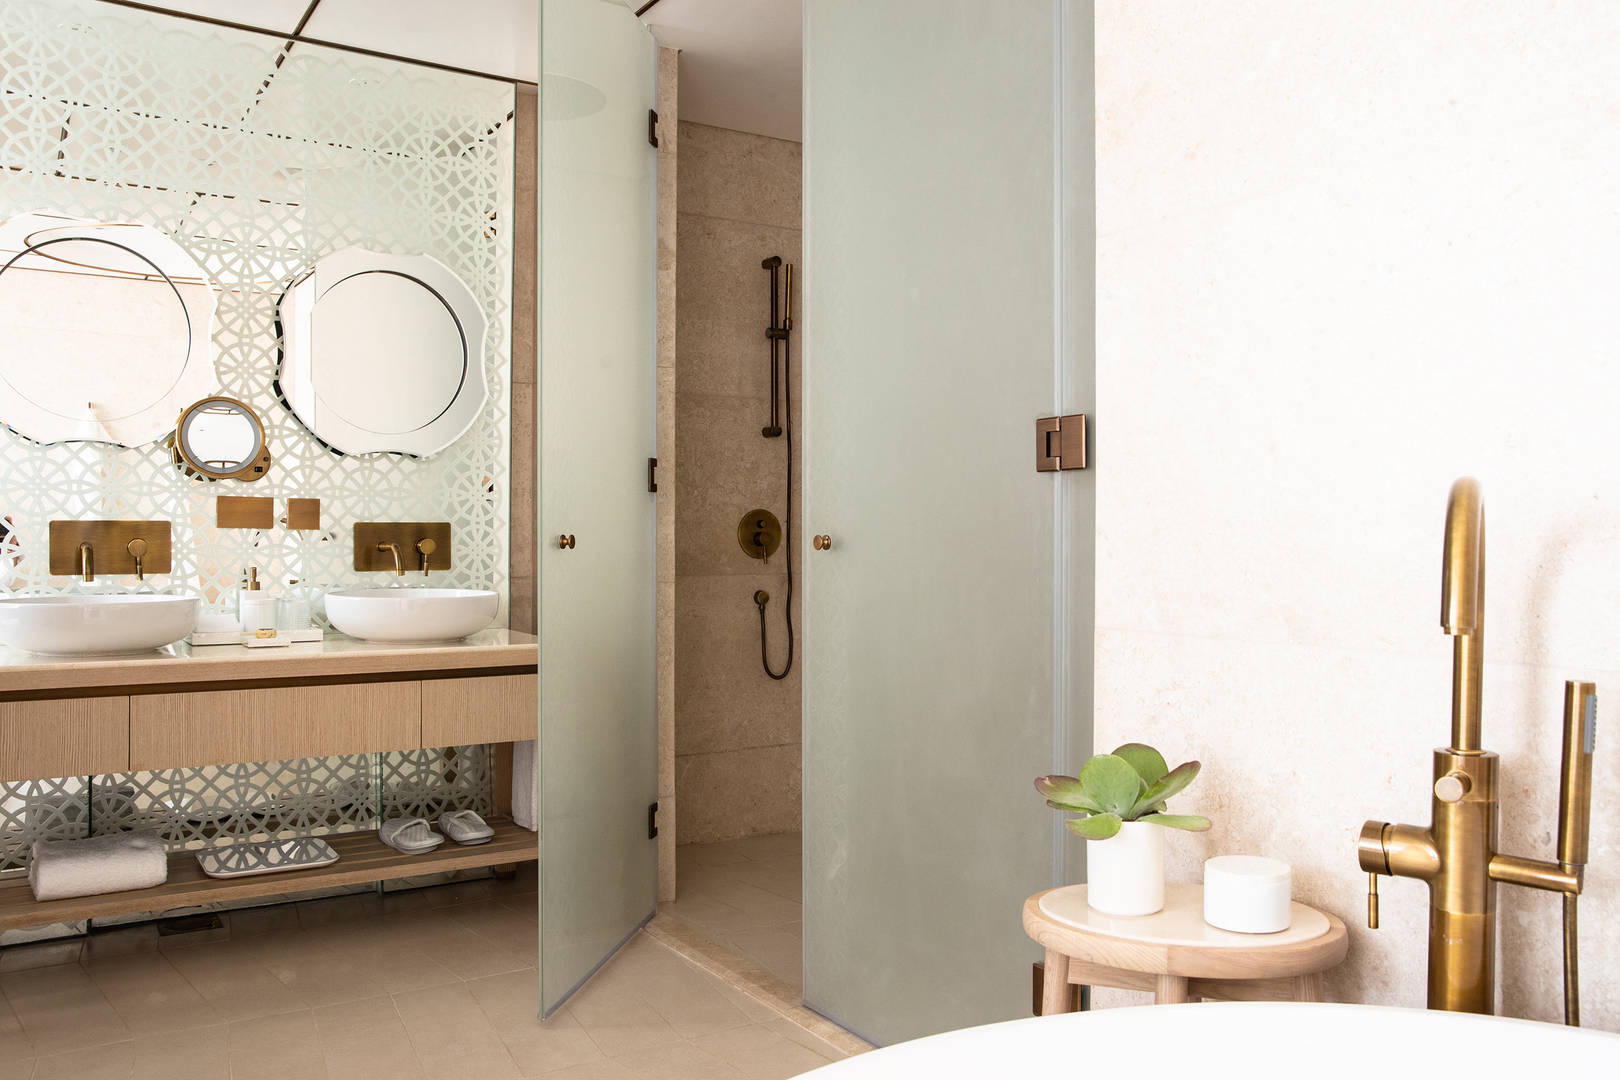 View of the Ocean Suite Bathroom at Jumeirah at Saadiyat Island Resort